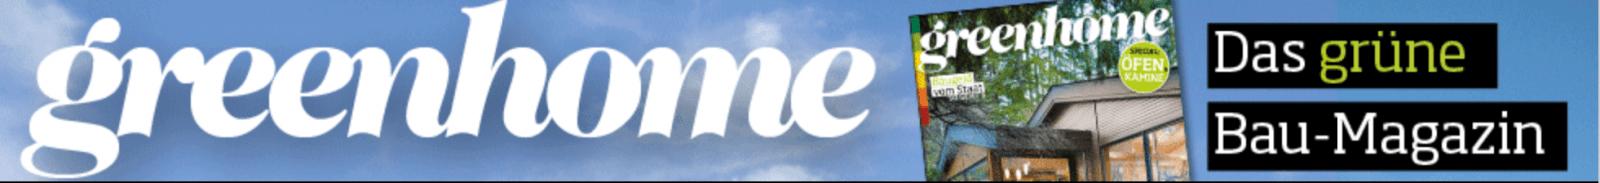 Greenhome_logo